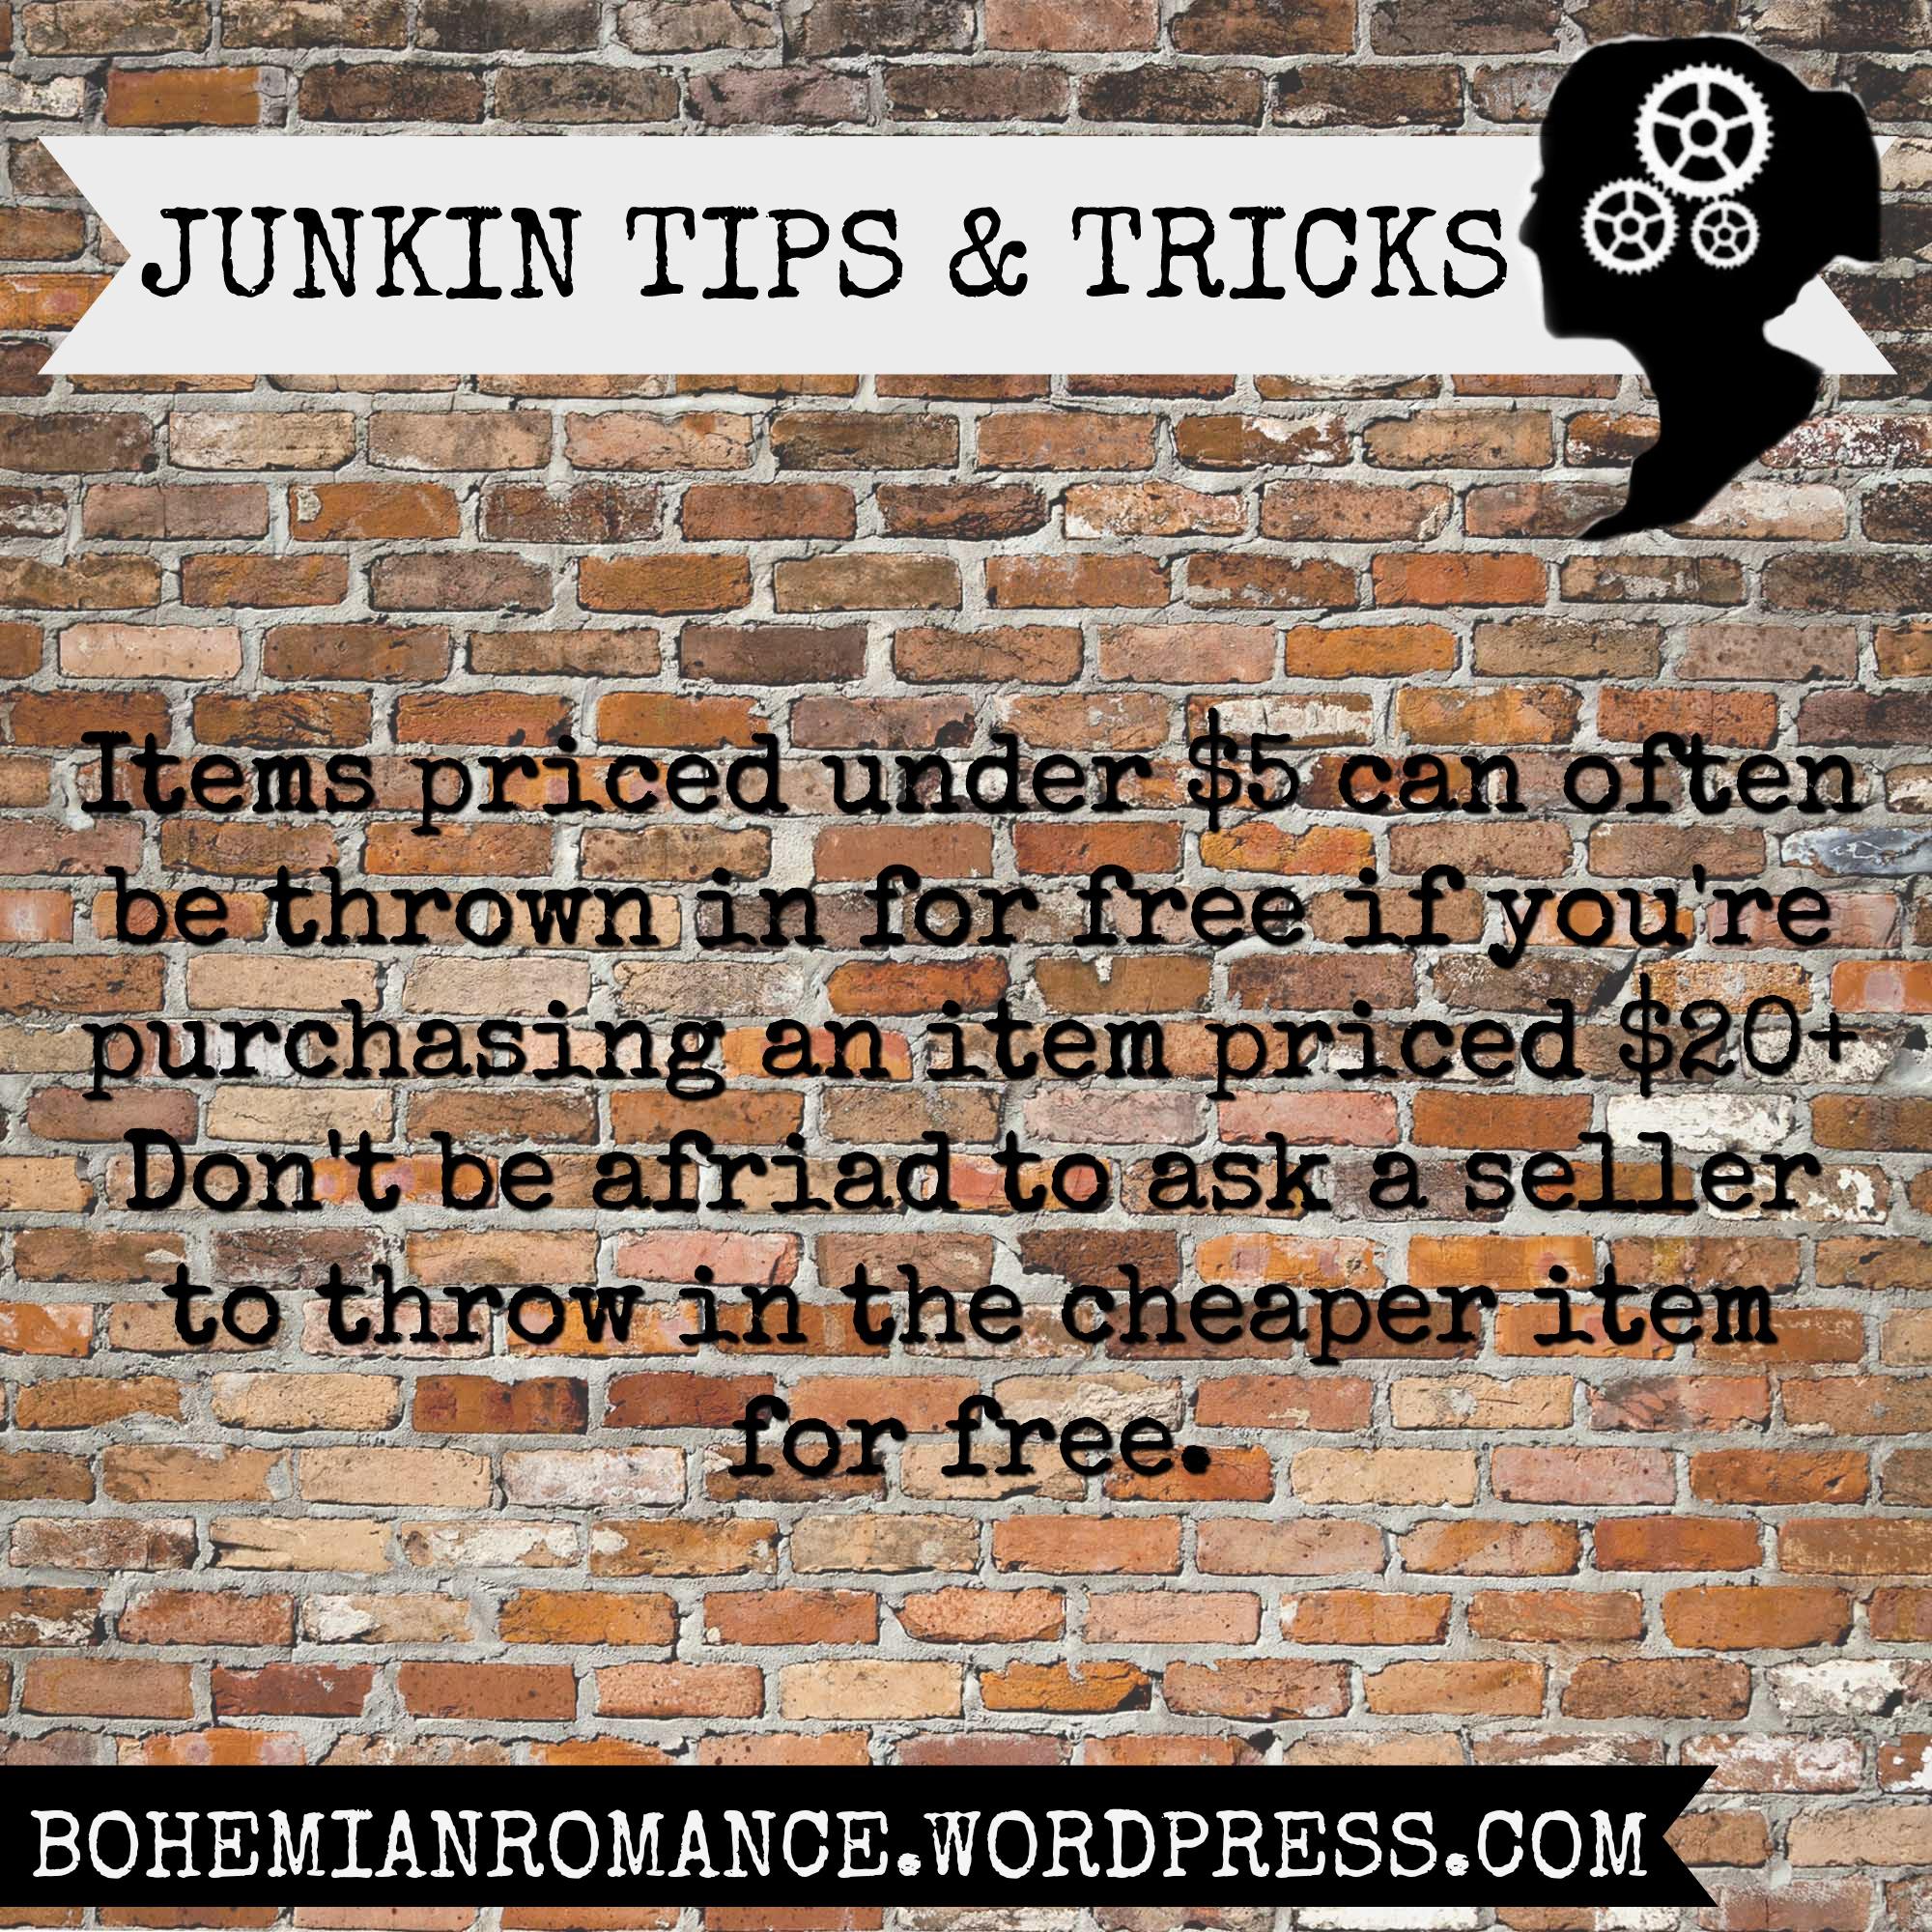 22-junkin-tips-tricks-template